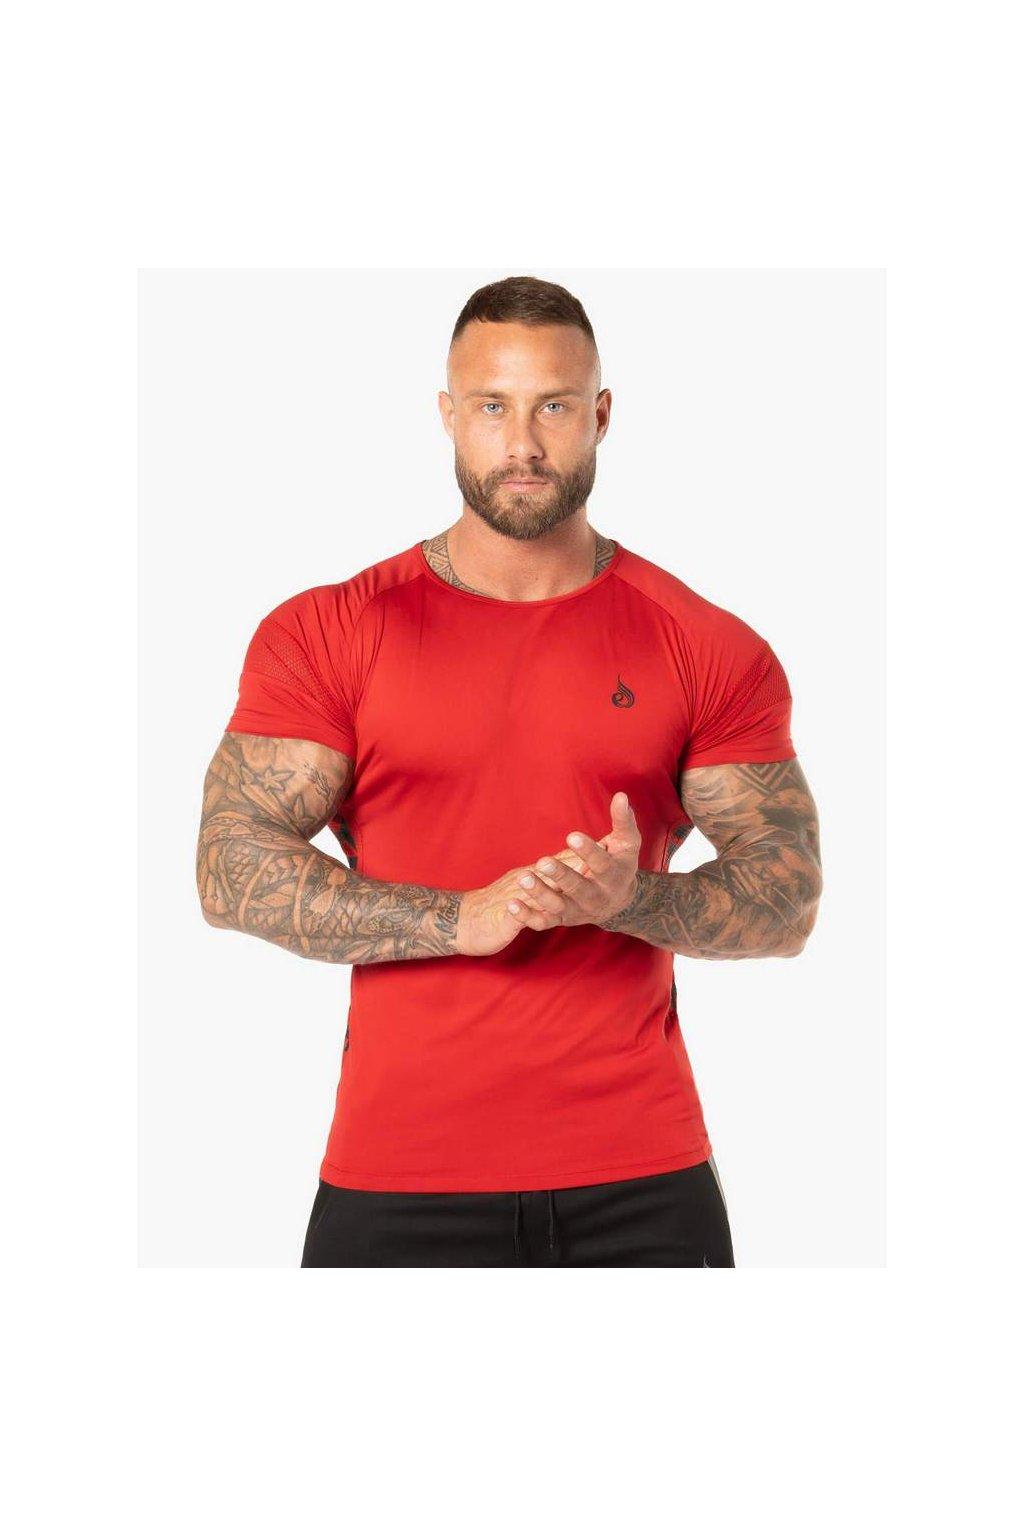 evo t shirt red clothing ryderwear 194955 1000x1000